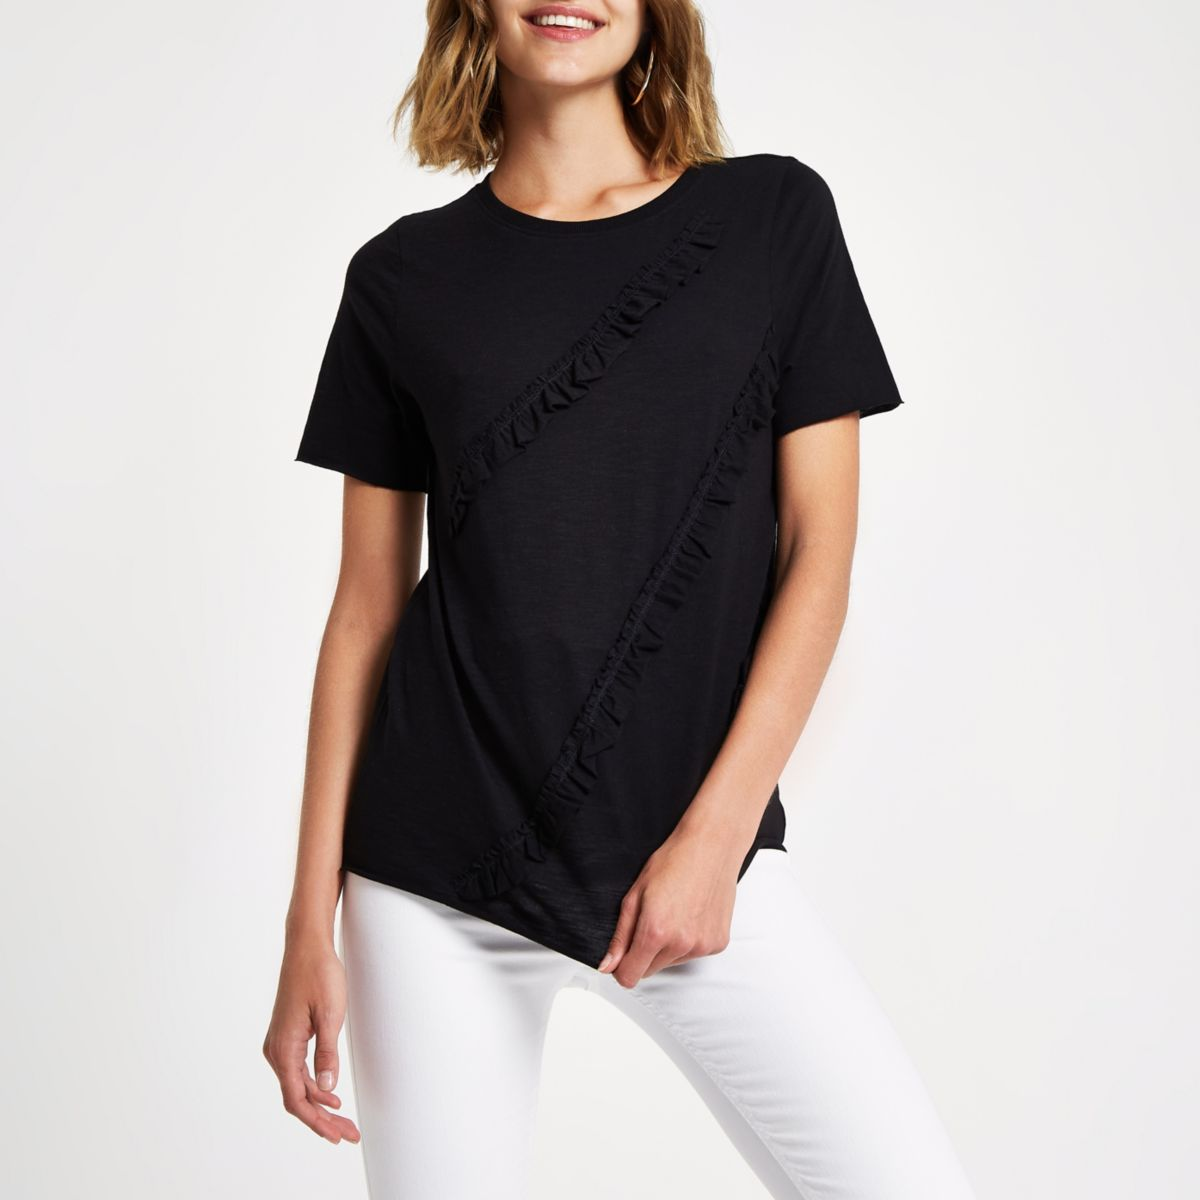 Black ruffle T-shirt